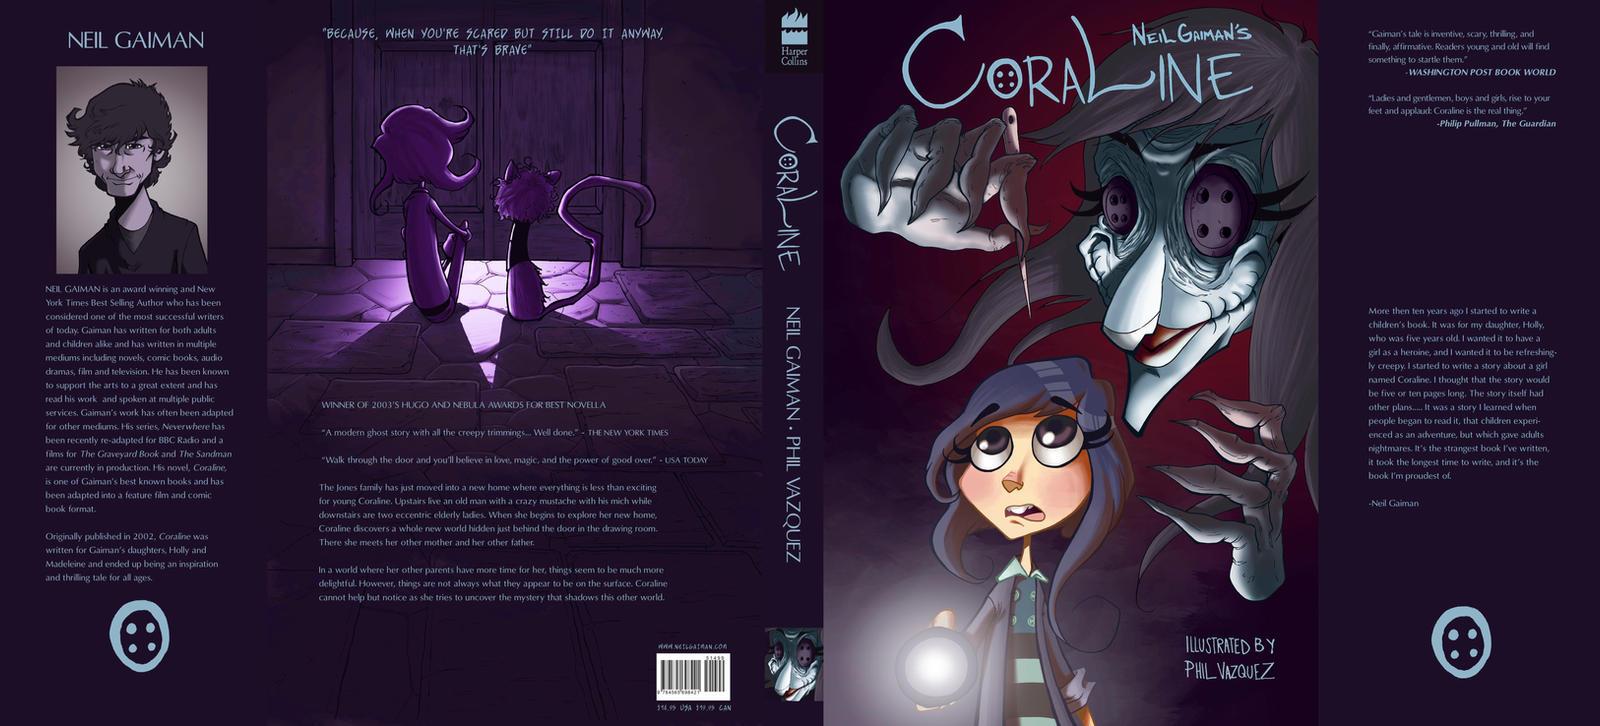 Coraline Comic Book Jacket by PhilVzQ on DeviantArt